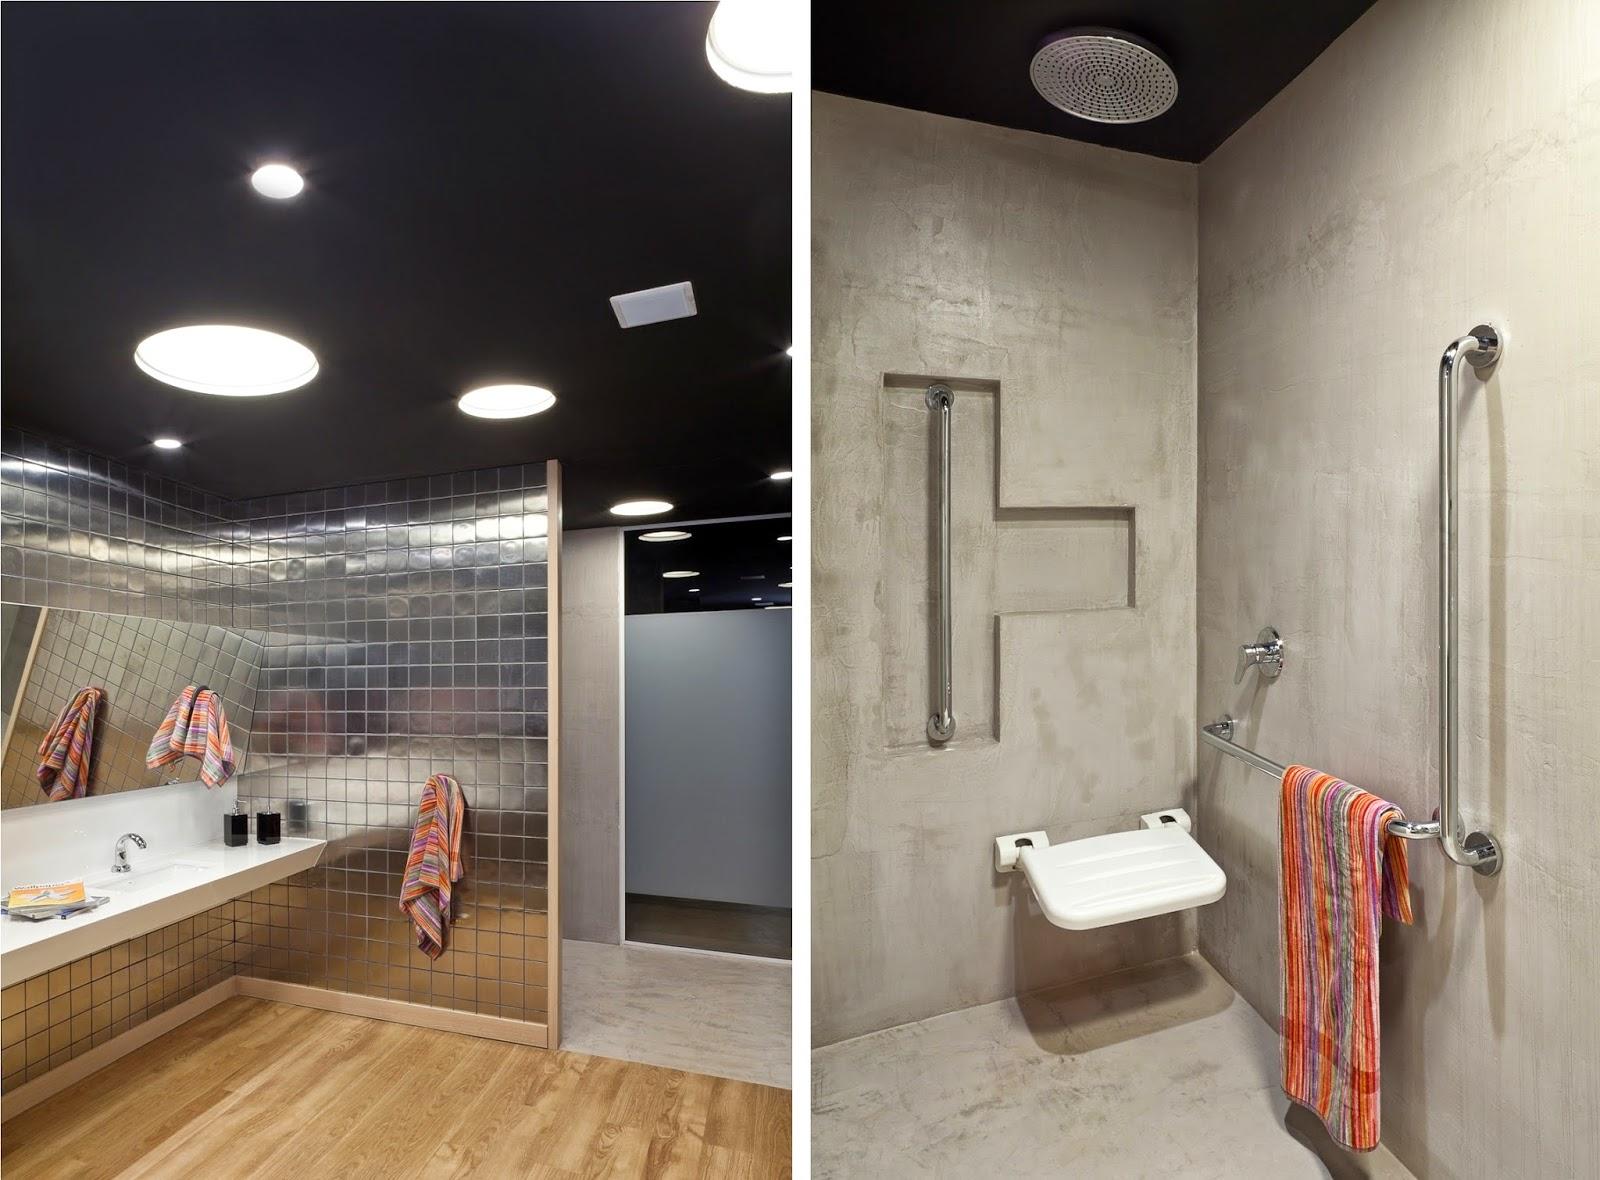 Banheiro Adaptado #A34228 1600x1180 Banheiro Adaptado